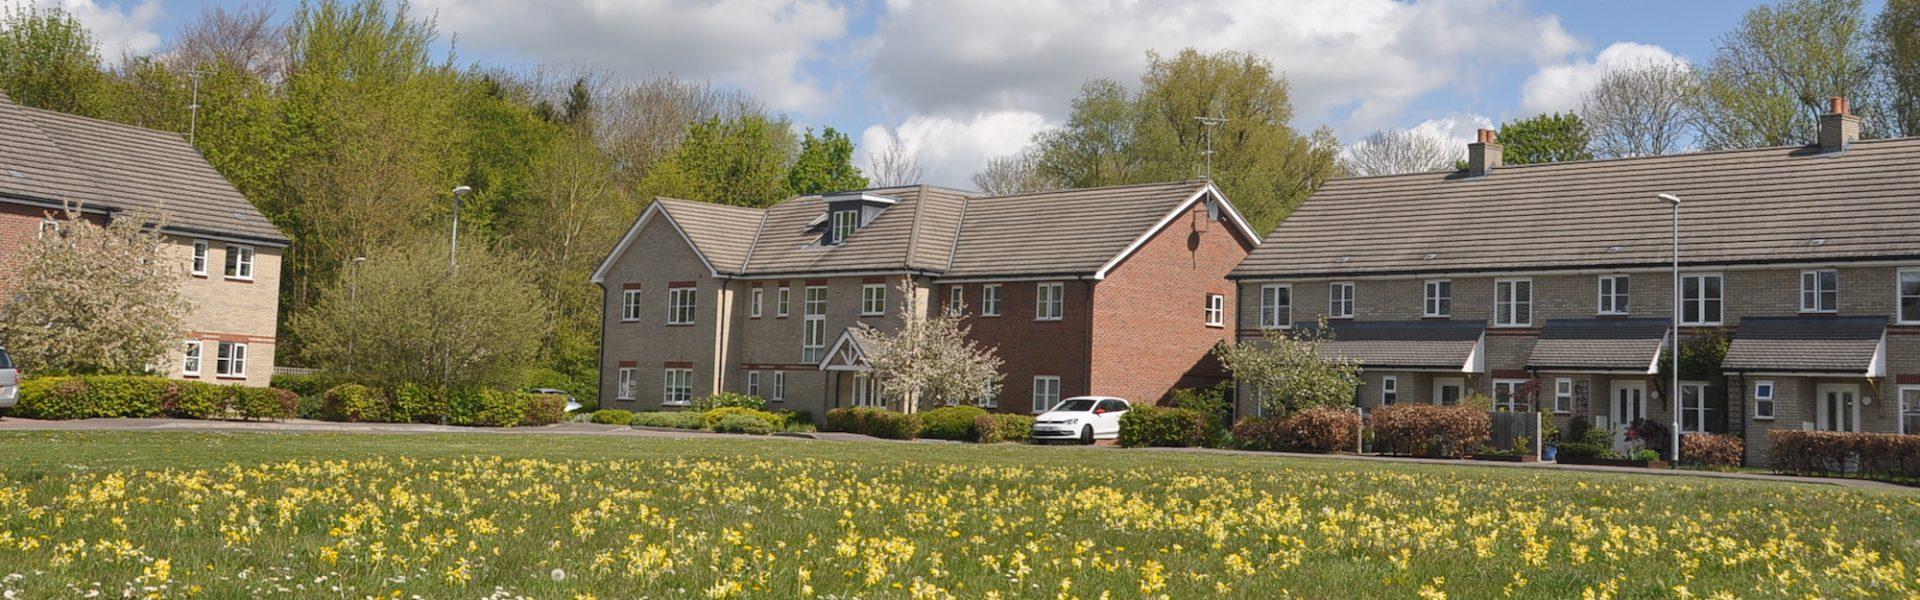 Barrington Parish Council